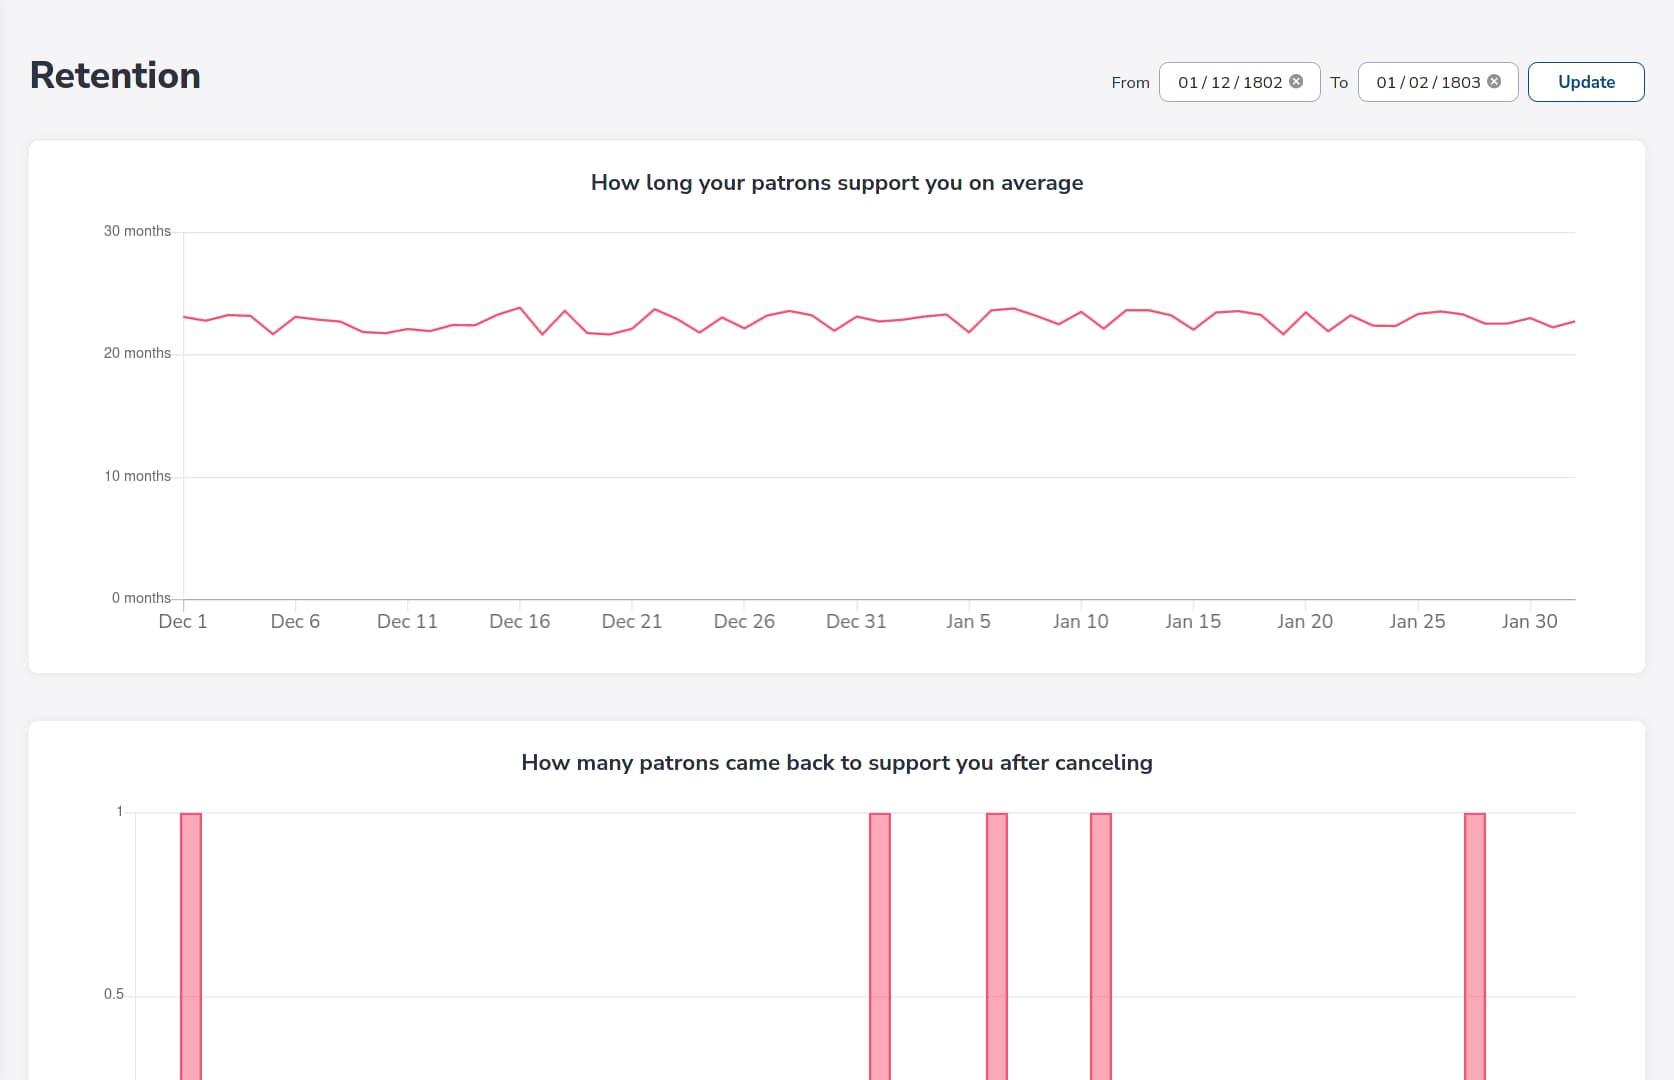 Sample of the retention metrics page